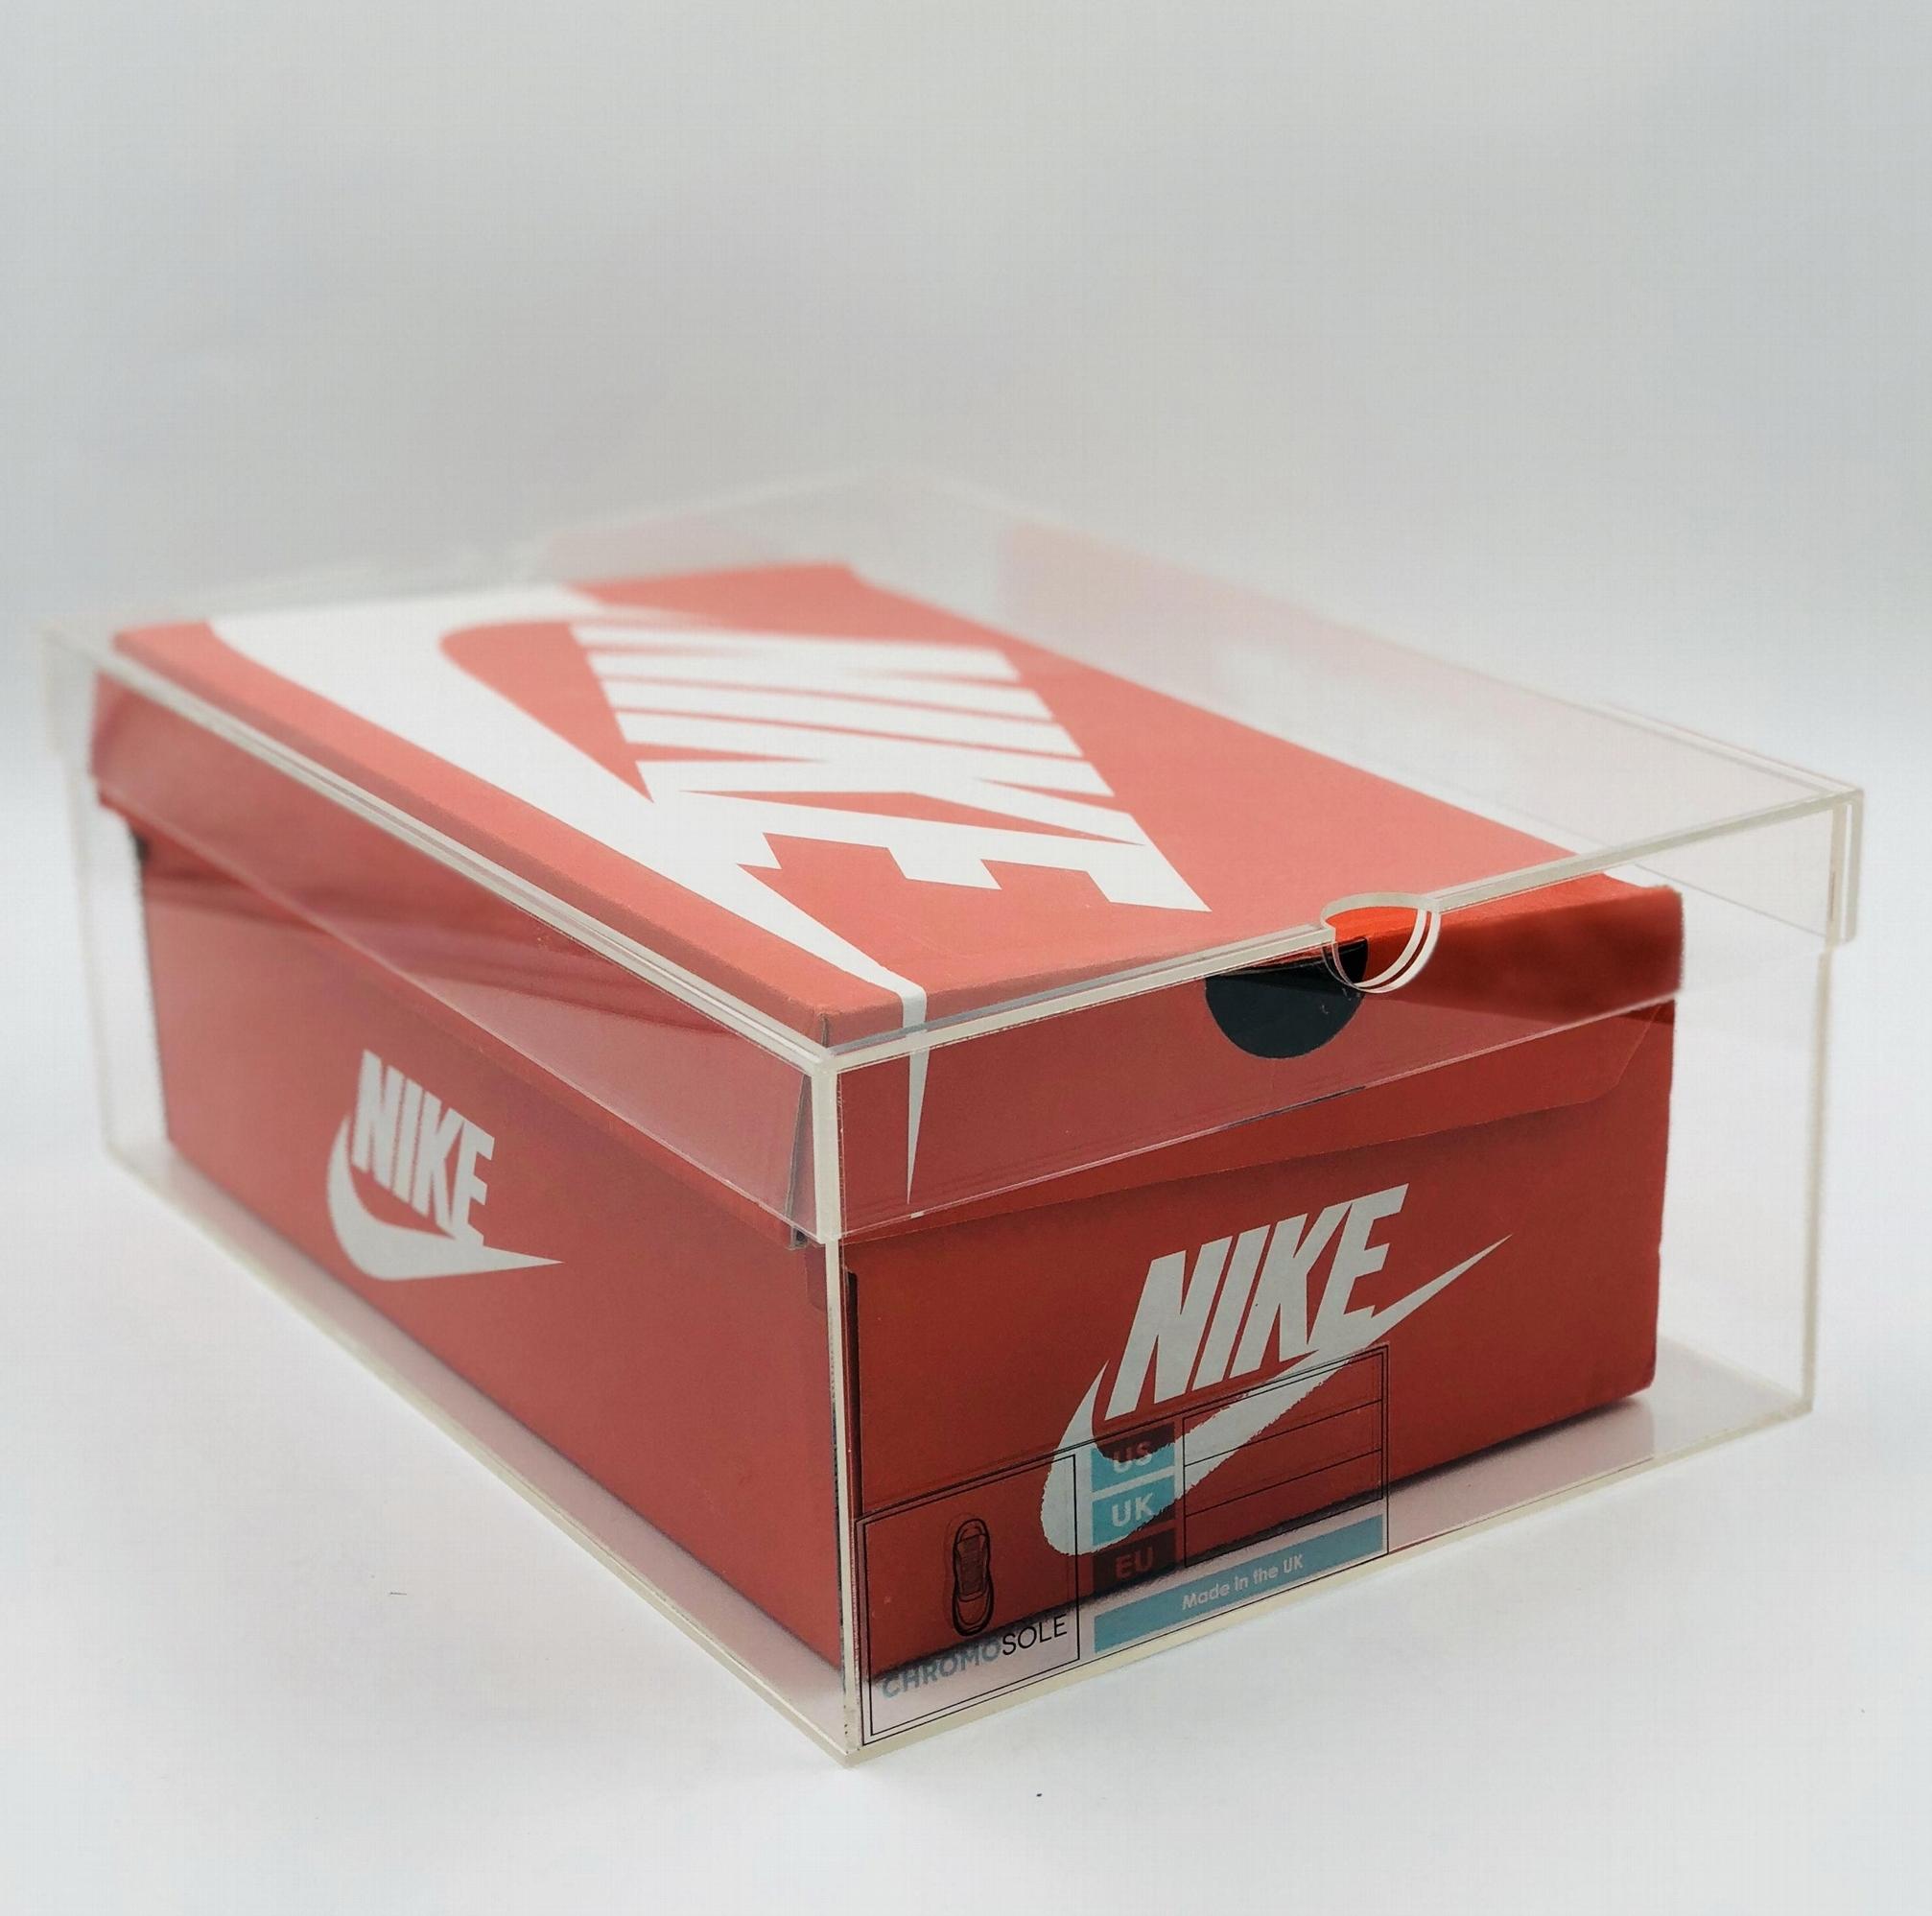 acrylic sneaker box, shose storage box, acrylic box